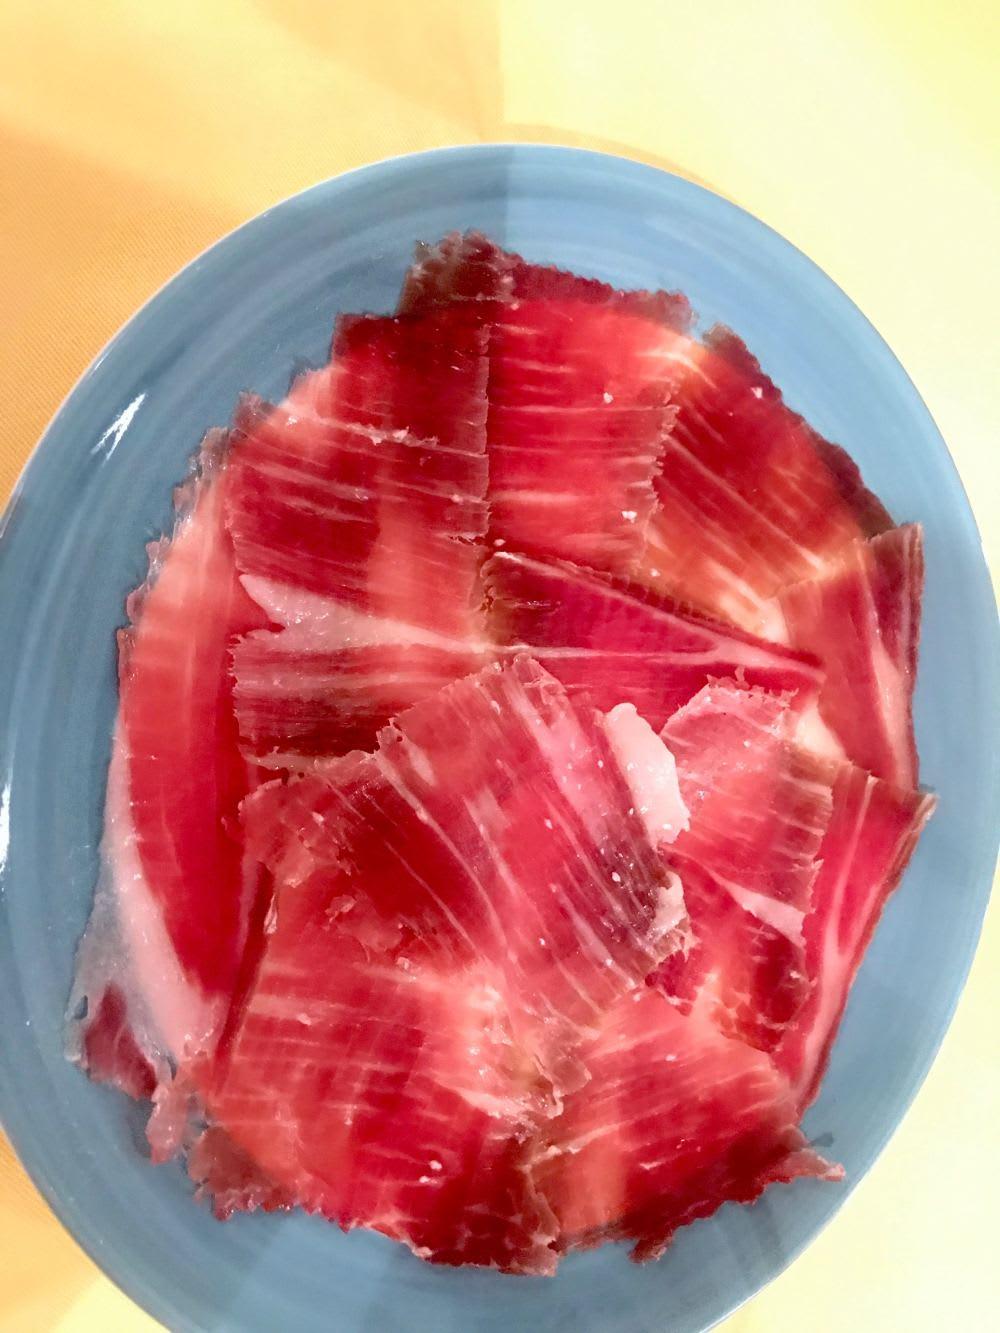 Ibério ham, Olé Hong Kong